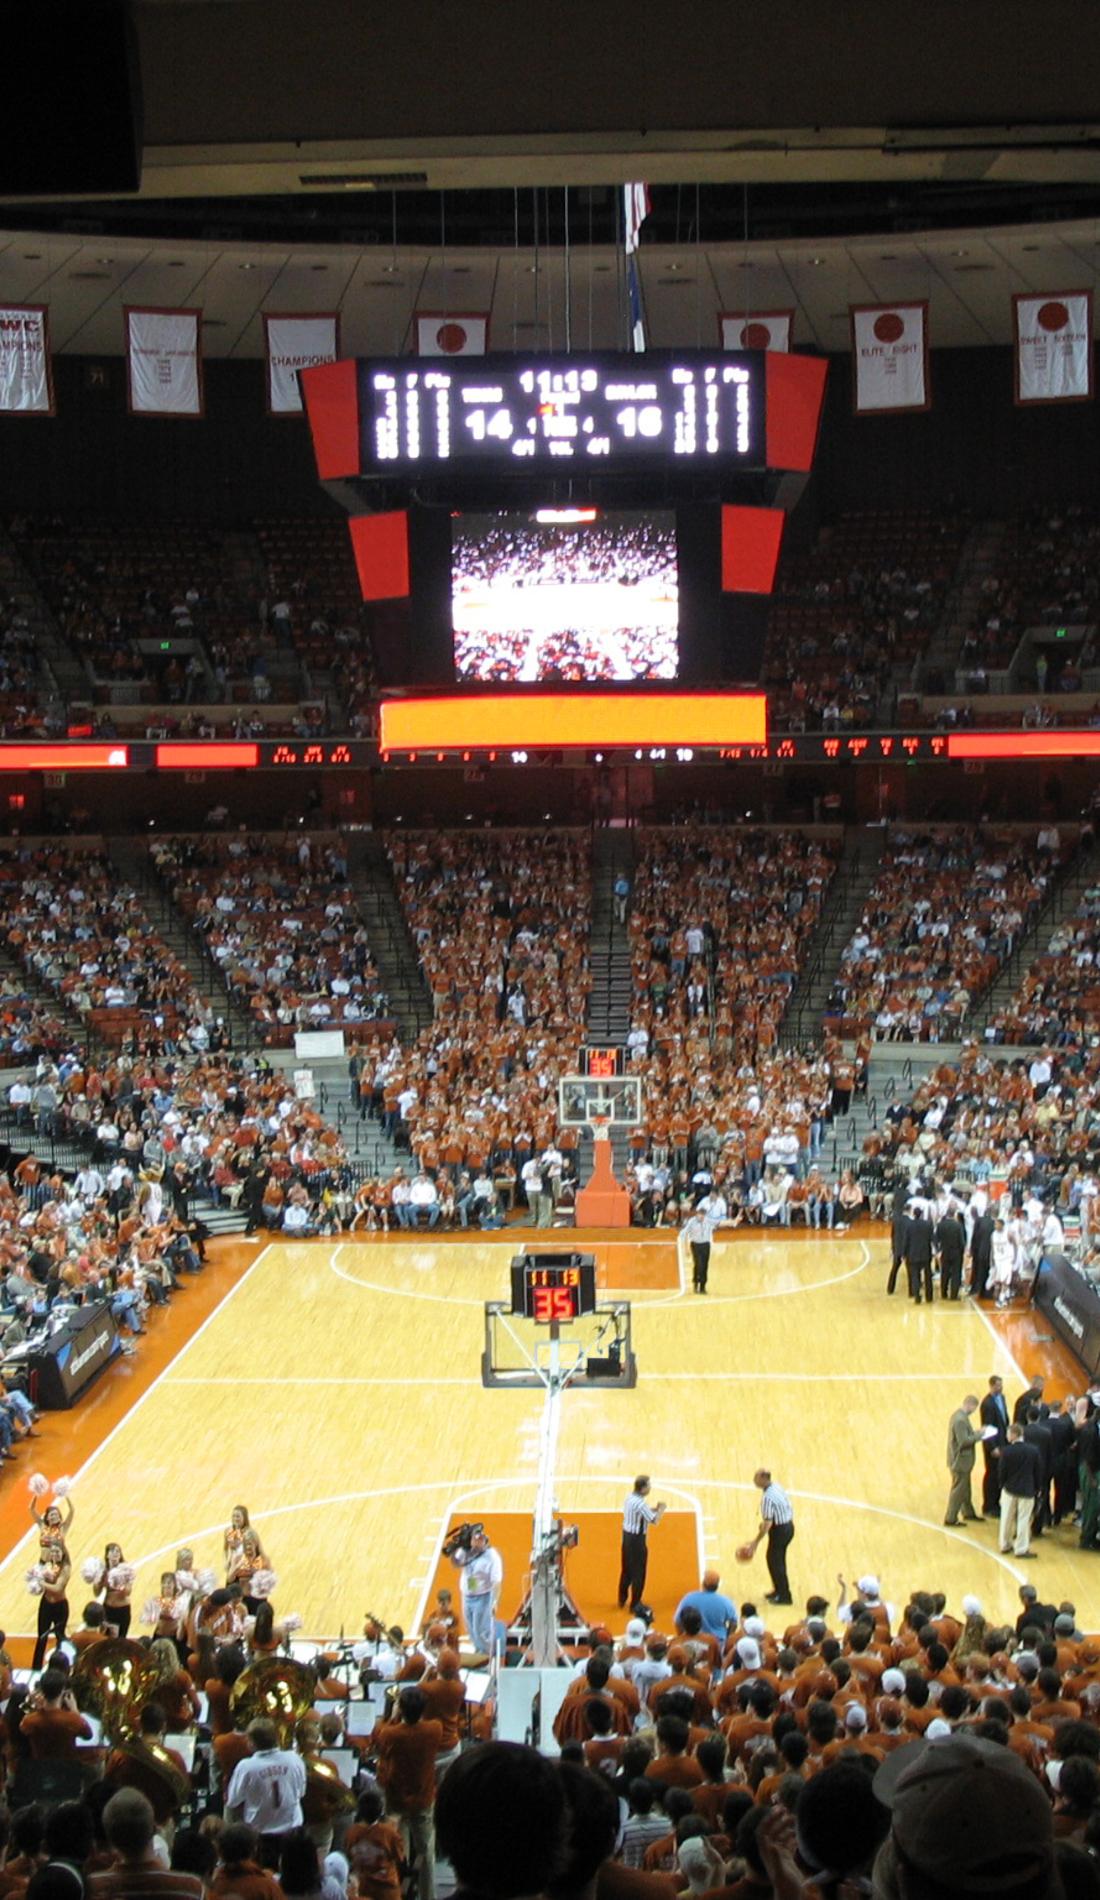 A Texas Longhorns Womens Basketball live event